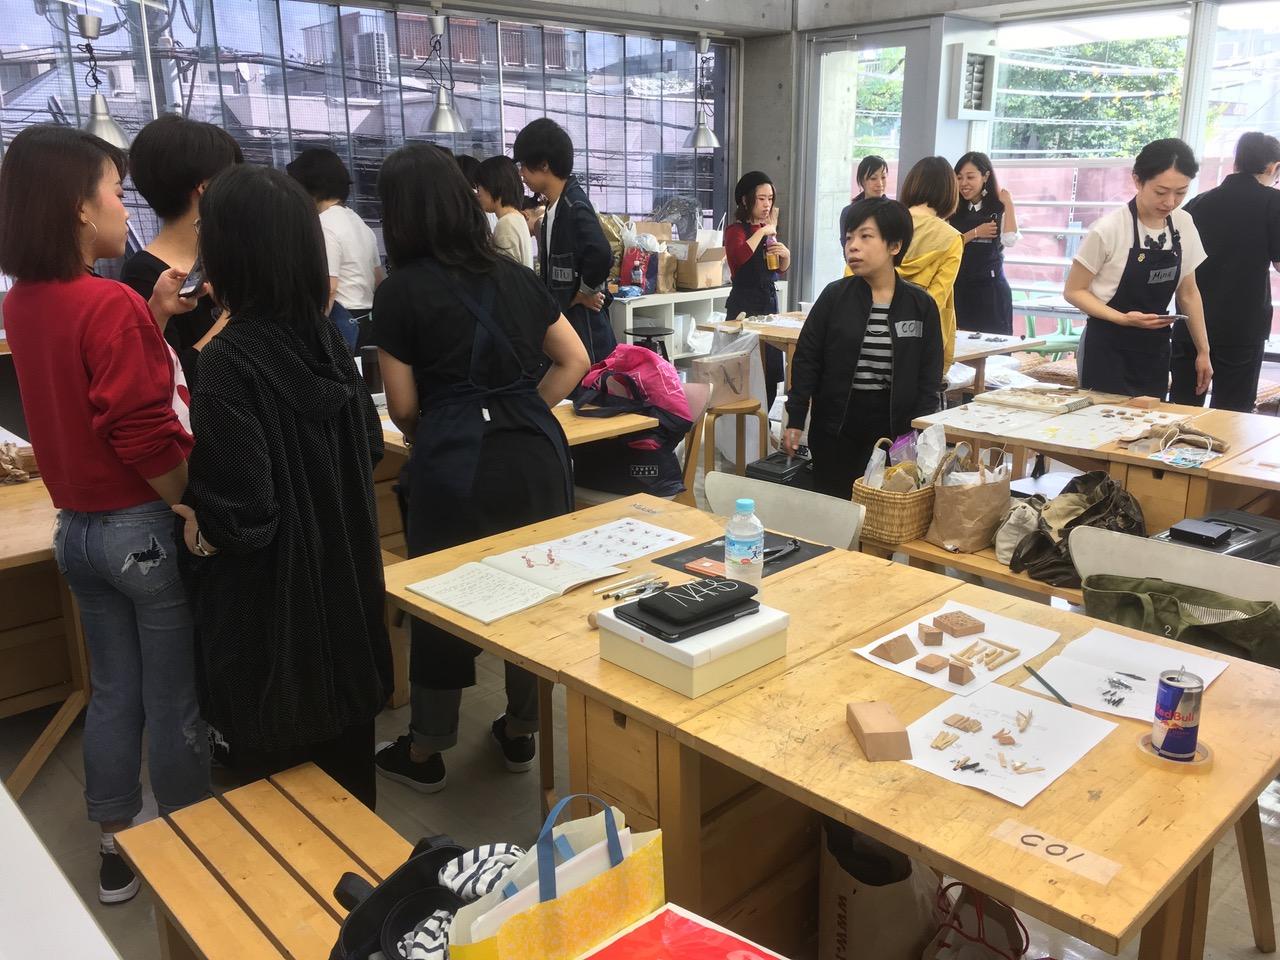 Hiko Mizuno College of Jewelry, Tokyo, 2016. Foto Beppe Kessler, klaslokaal